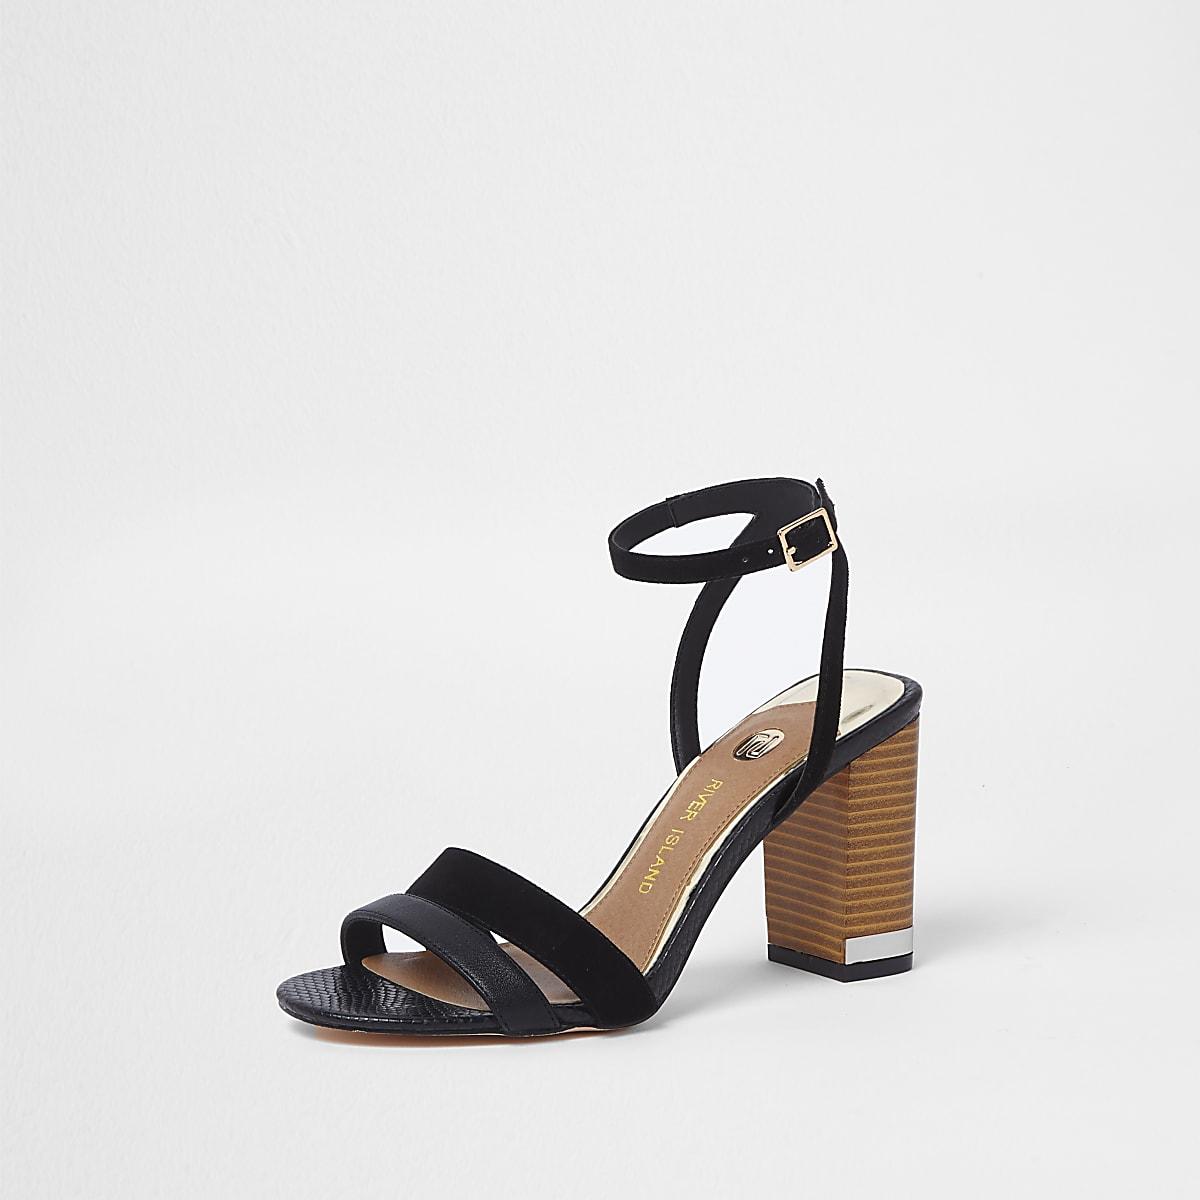 3e95bdc910 Black block heel sandals - Sandals - Shoes & Boots - women